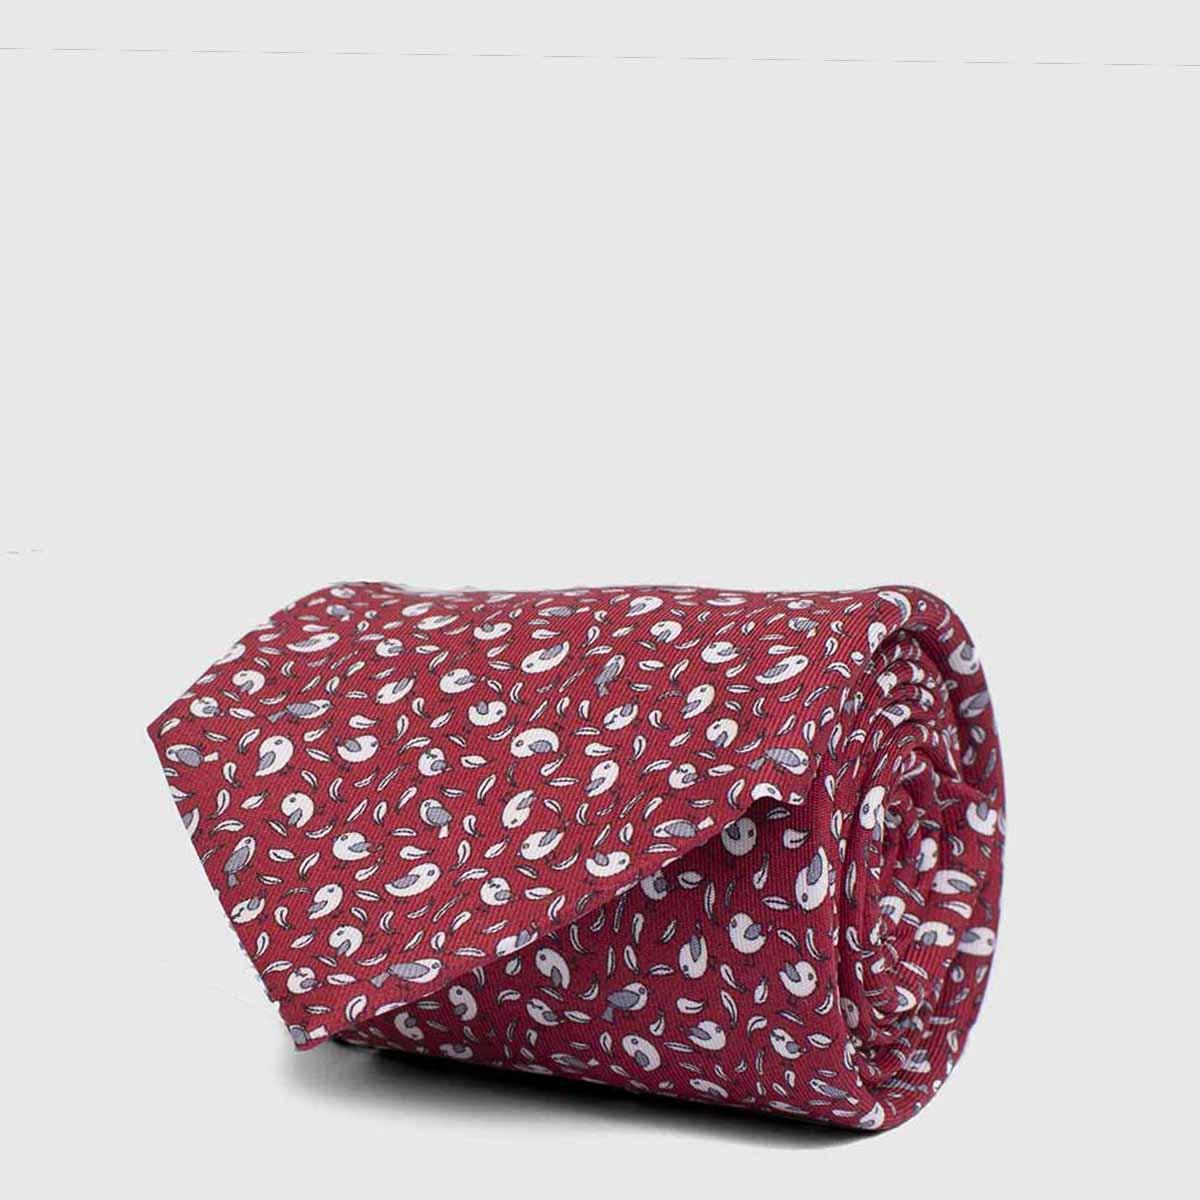 Red background 5-Fold Tie with micromotiv birds